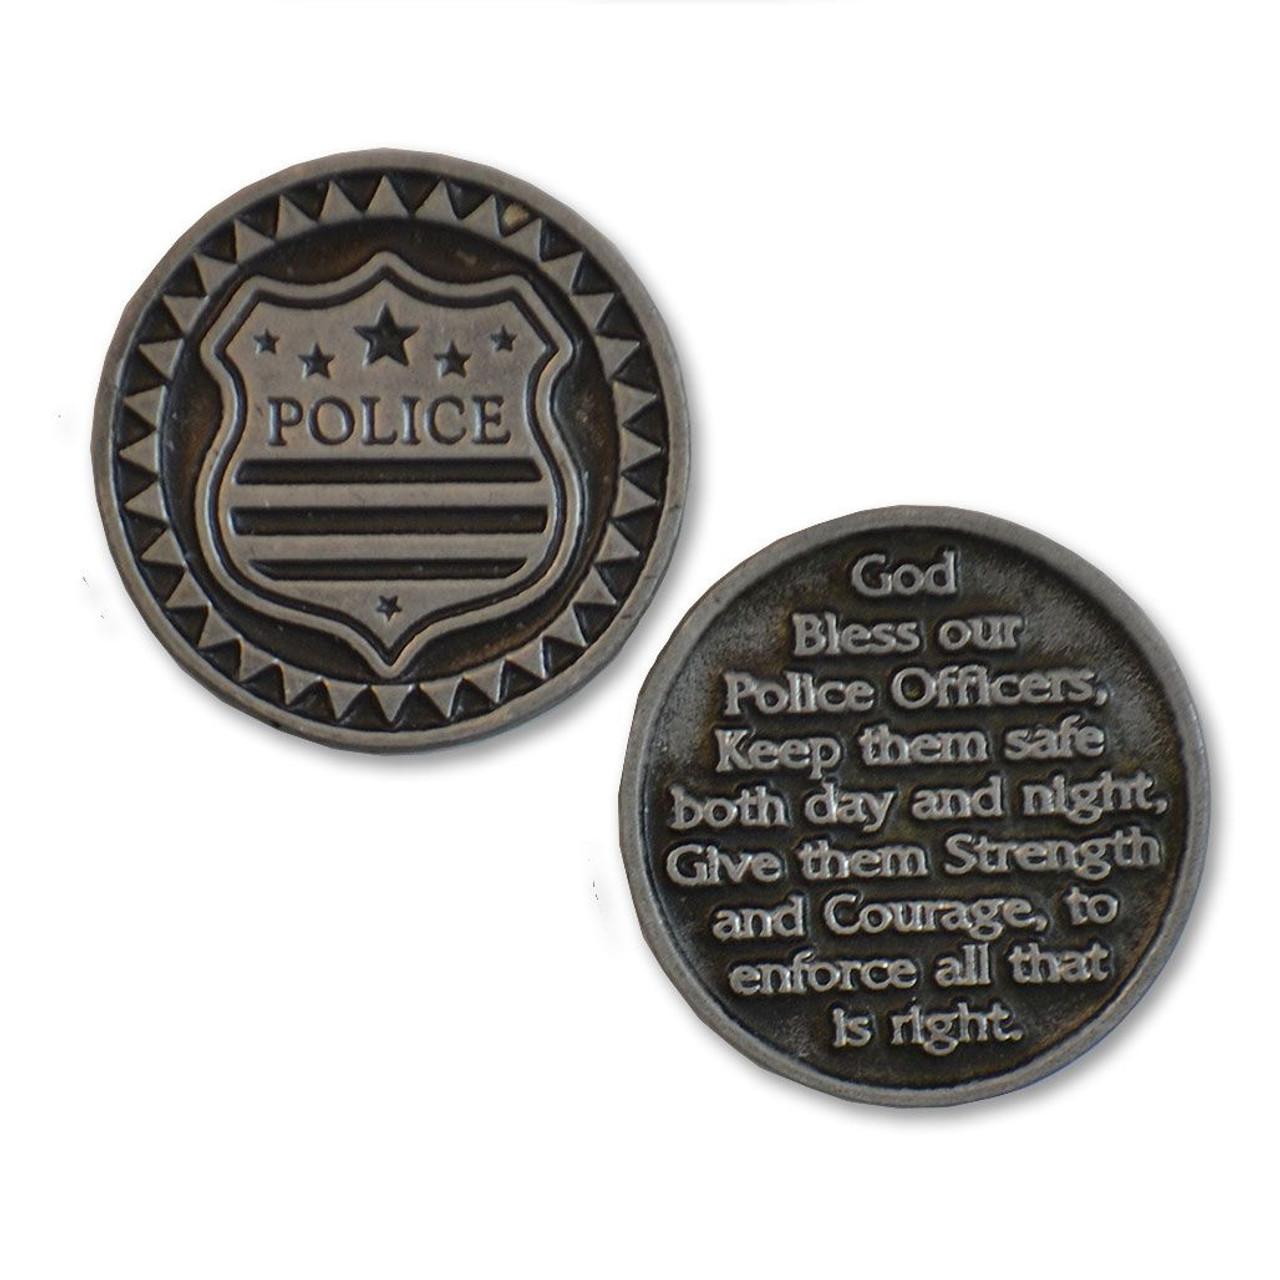 Police Pocket Token